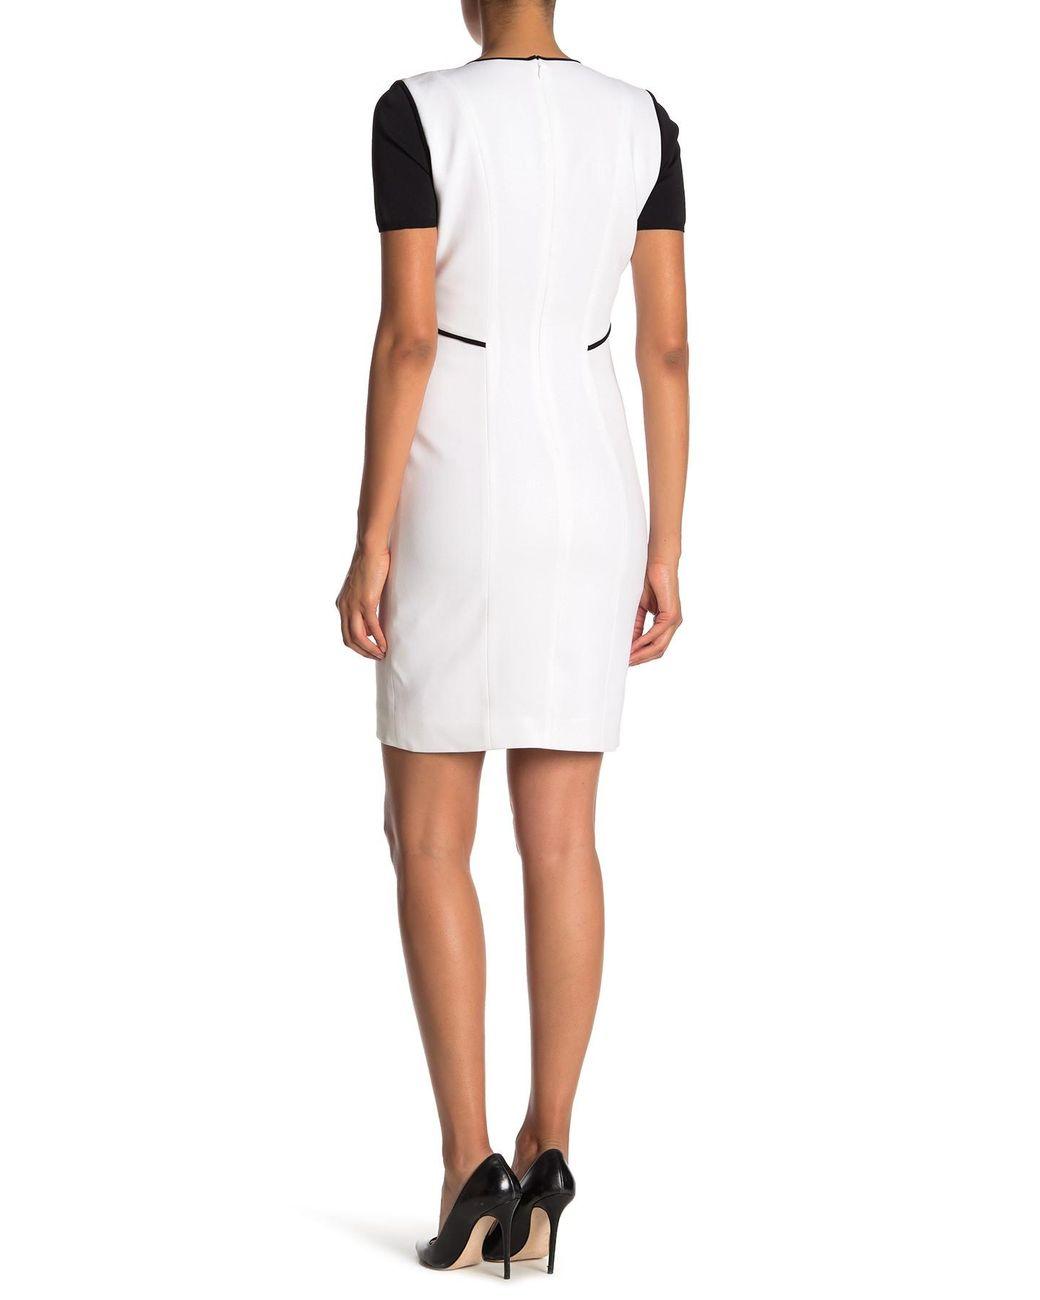 e5b2555d3dd11 Elie Tahari Nixie Keyhole Sheath Dress in White - Save 6% - Lyst